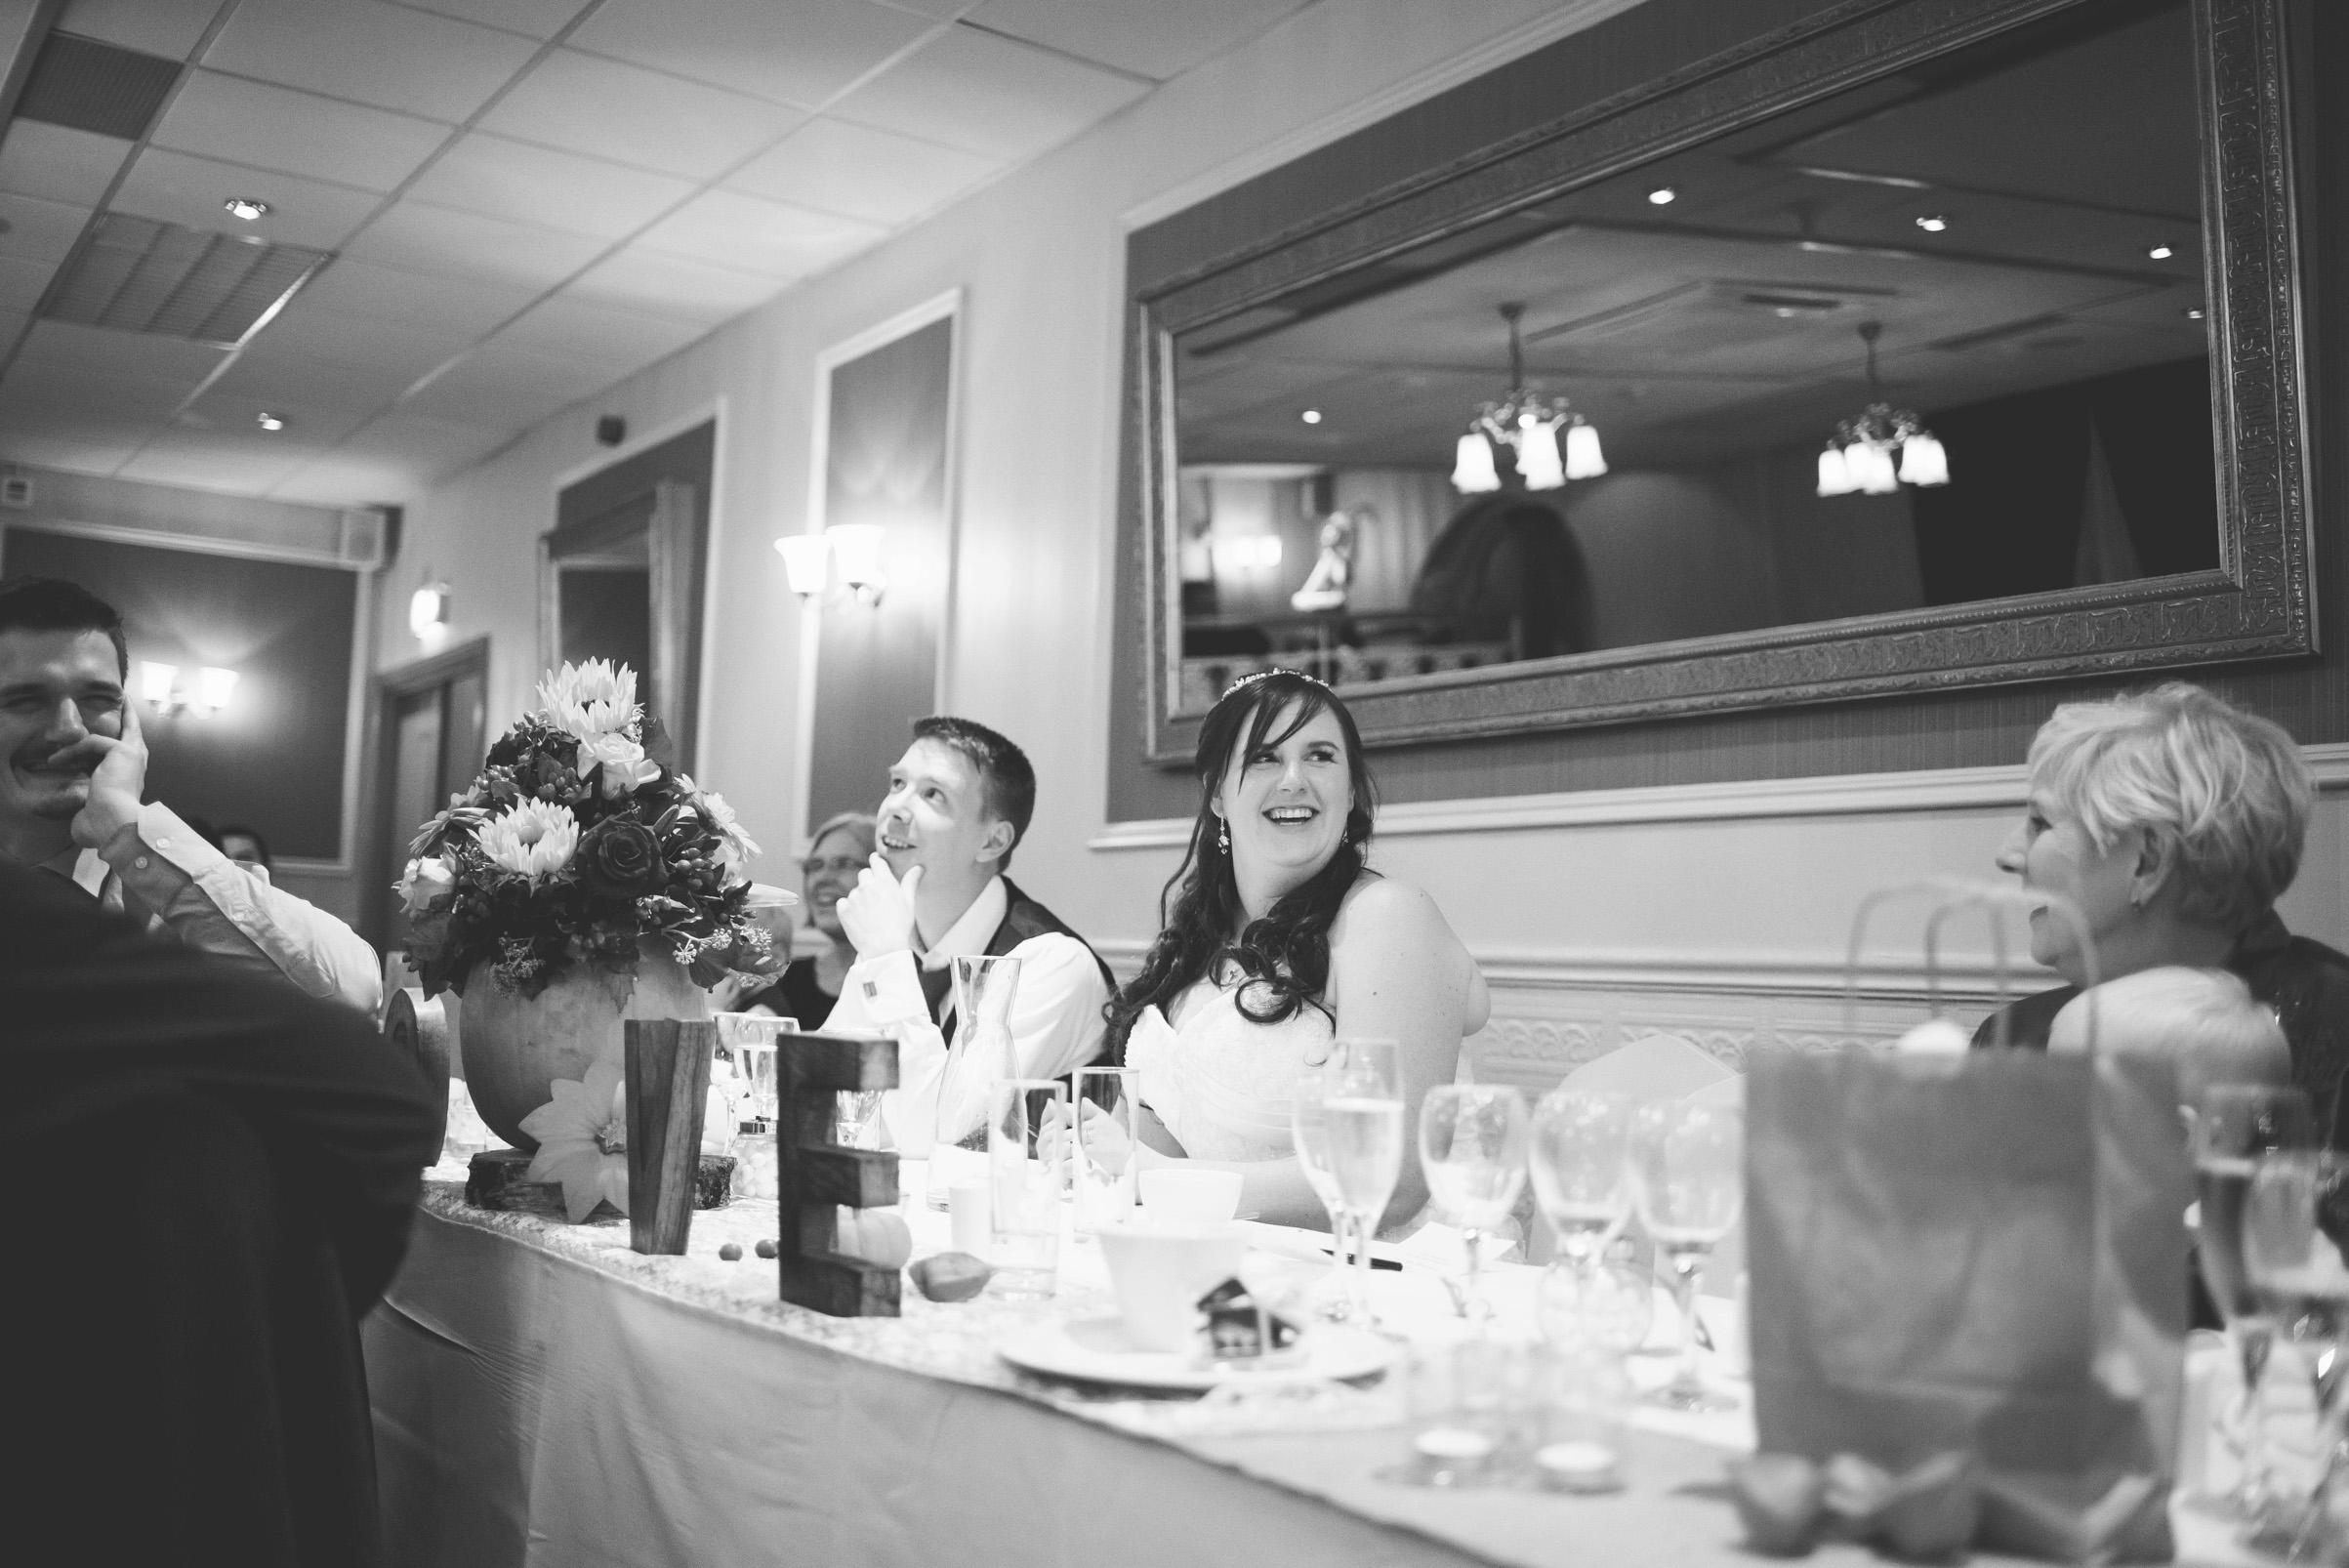 The+Fairlawns+wedding+Aldridge+StLukes+Church-181.jpg